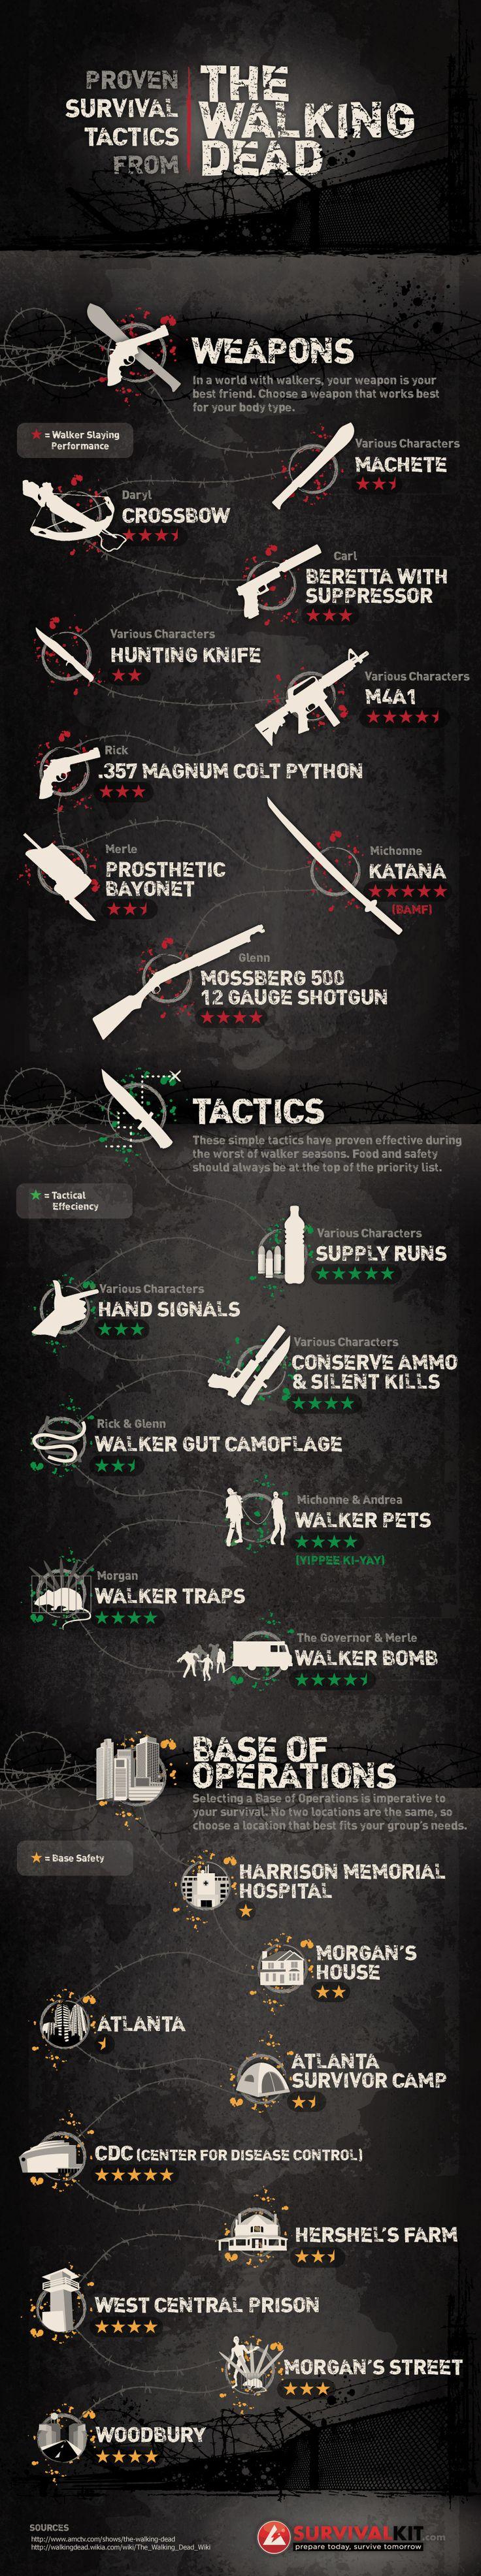 90 best images about zap zombie apocalypse preparation